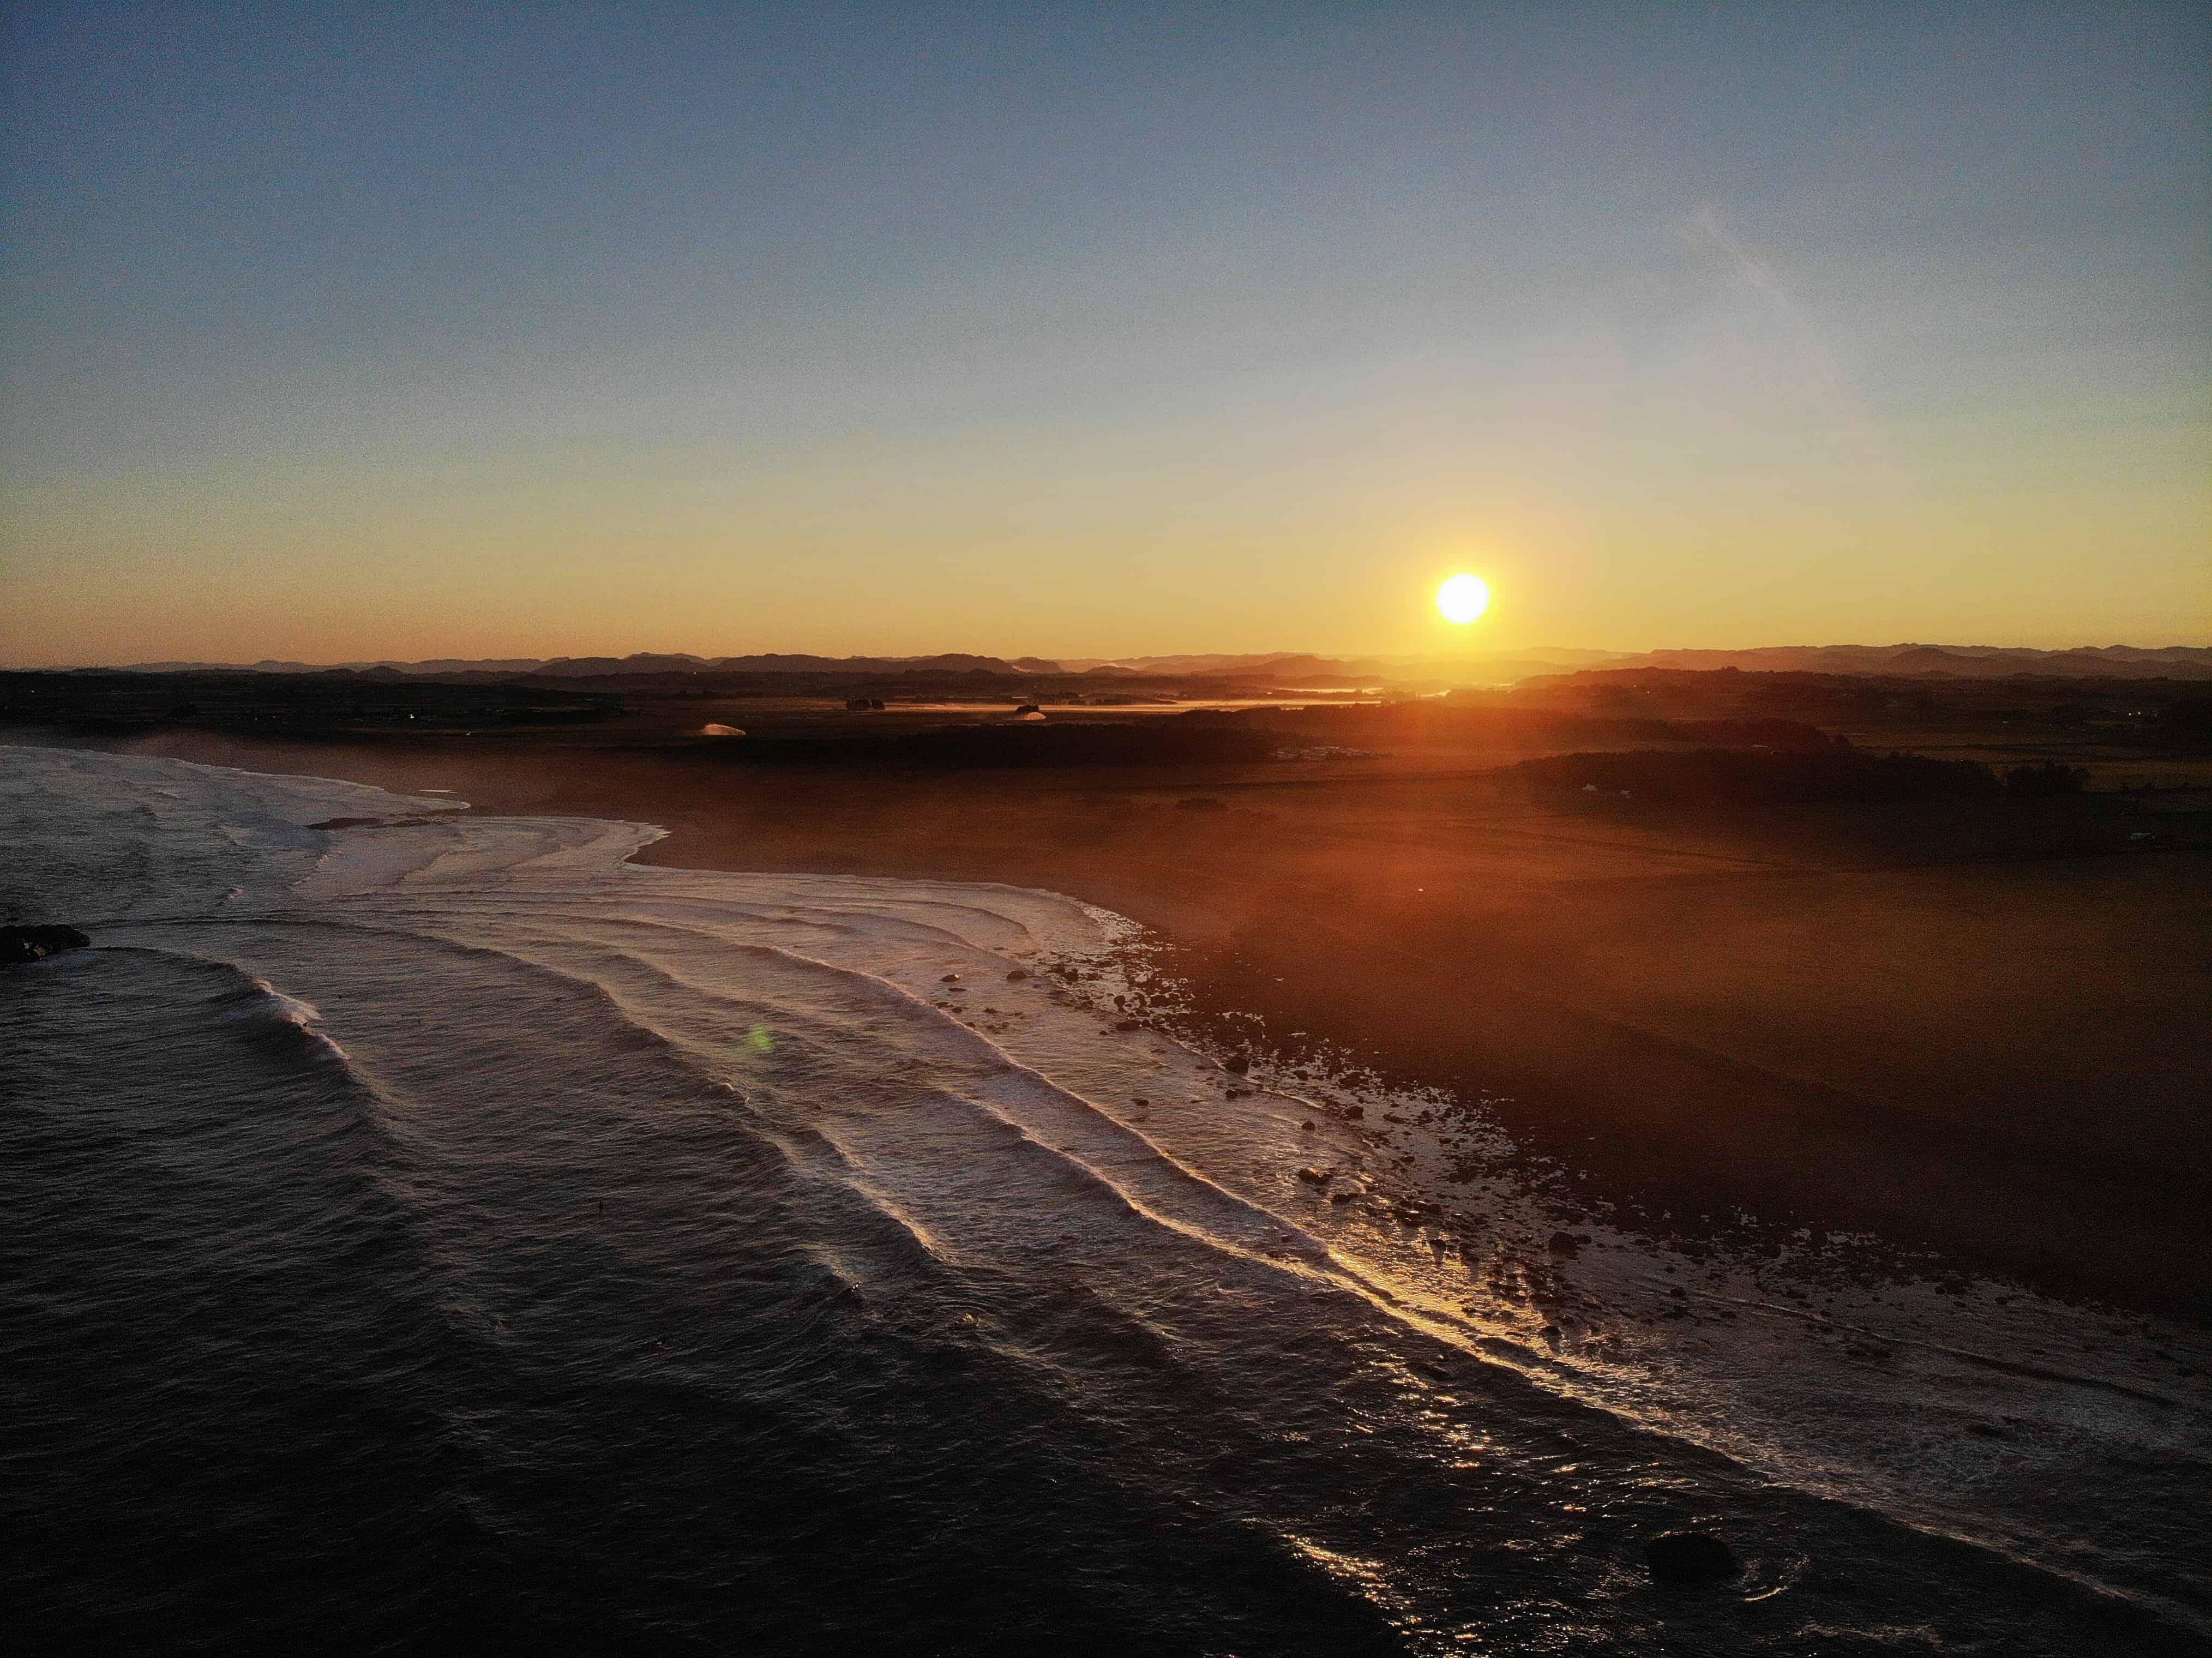 Jærsk solnedgang. Foto: Valentin Launay